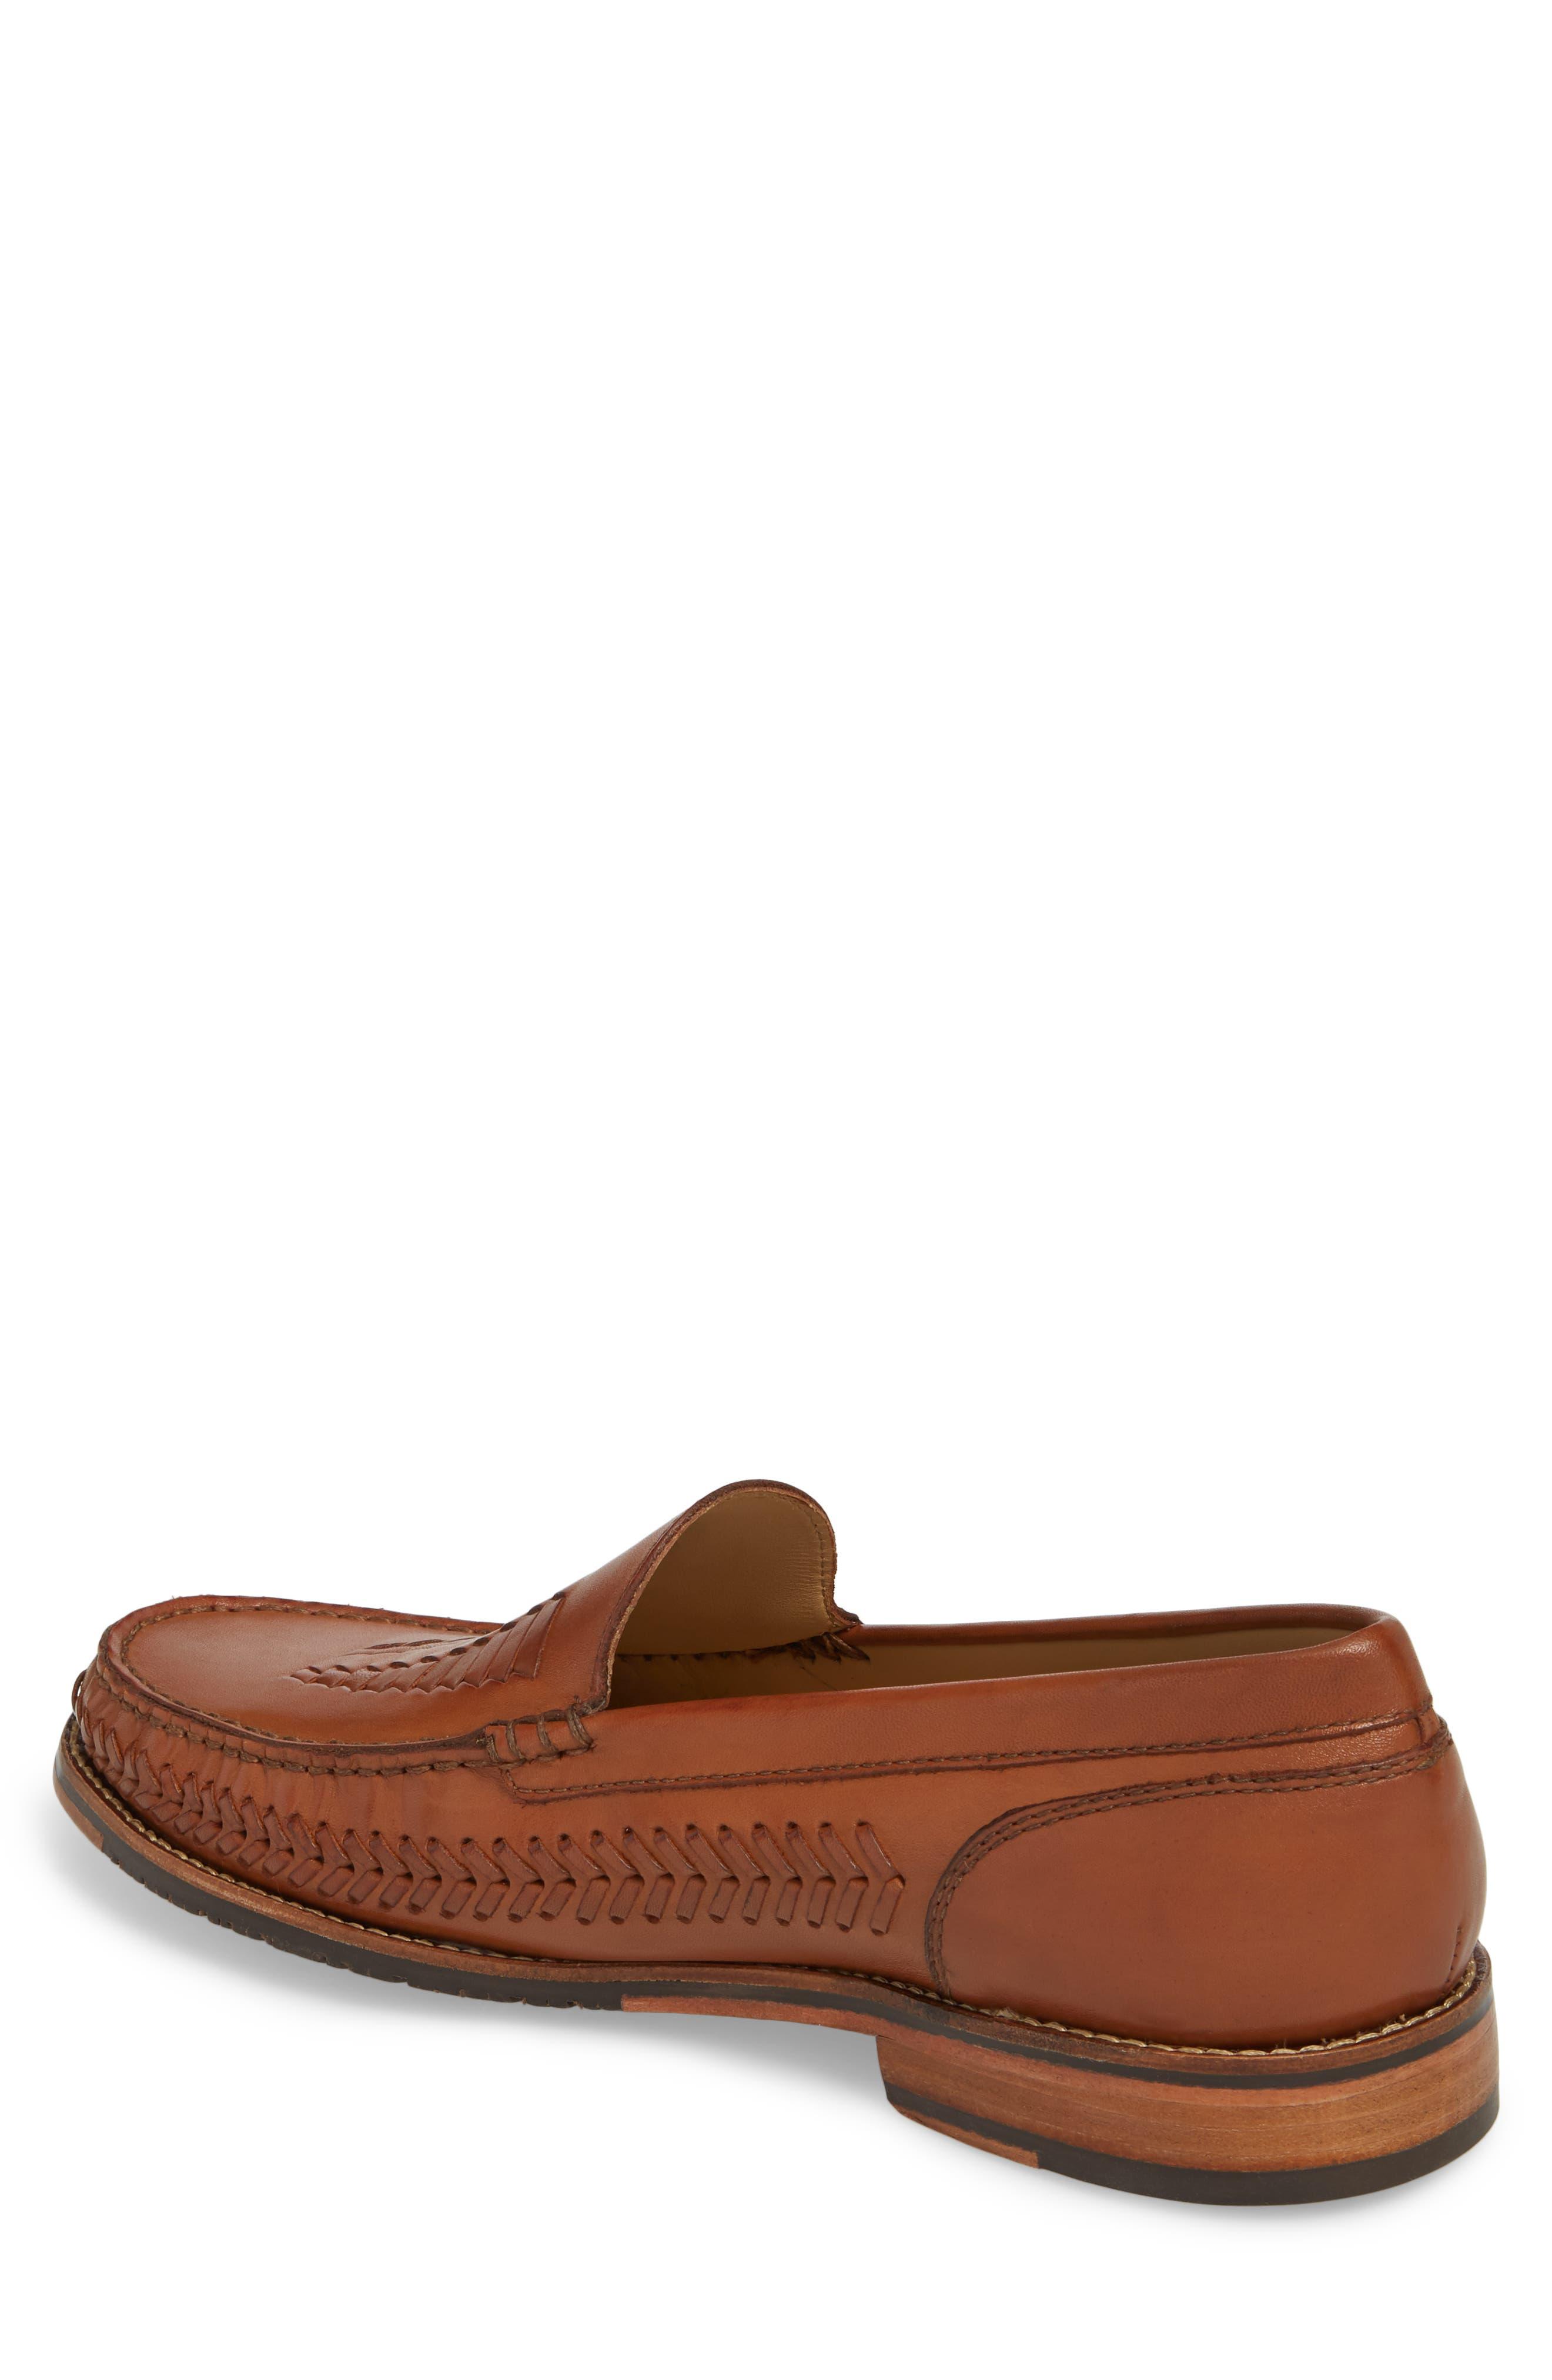 Hasslington Woven Venetian Loafer,                             Alternate thumbnail 2, color,                             Tan Leather